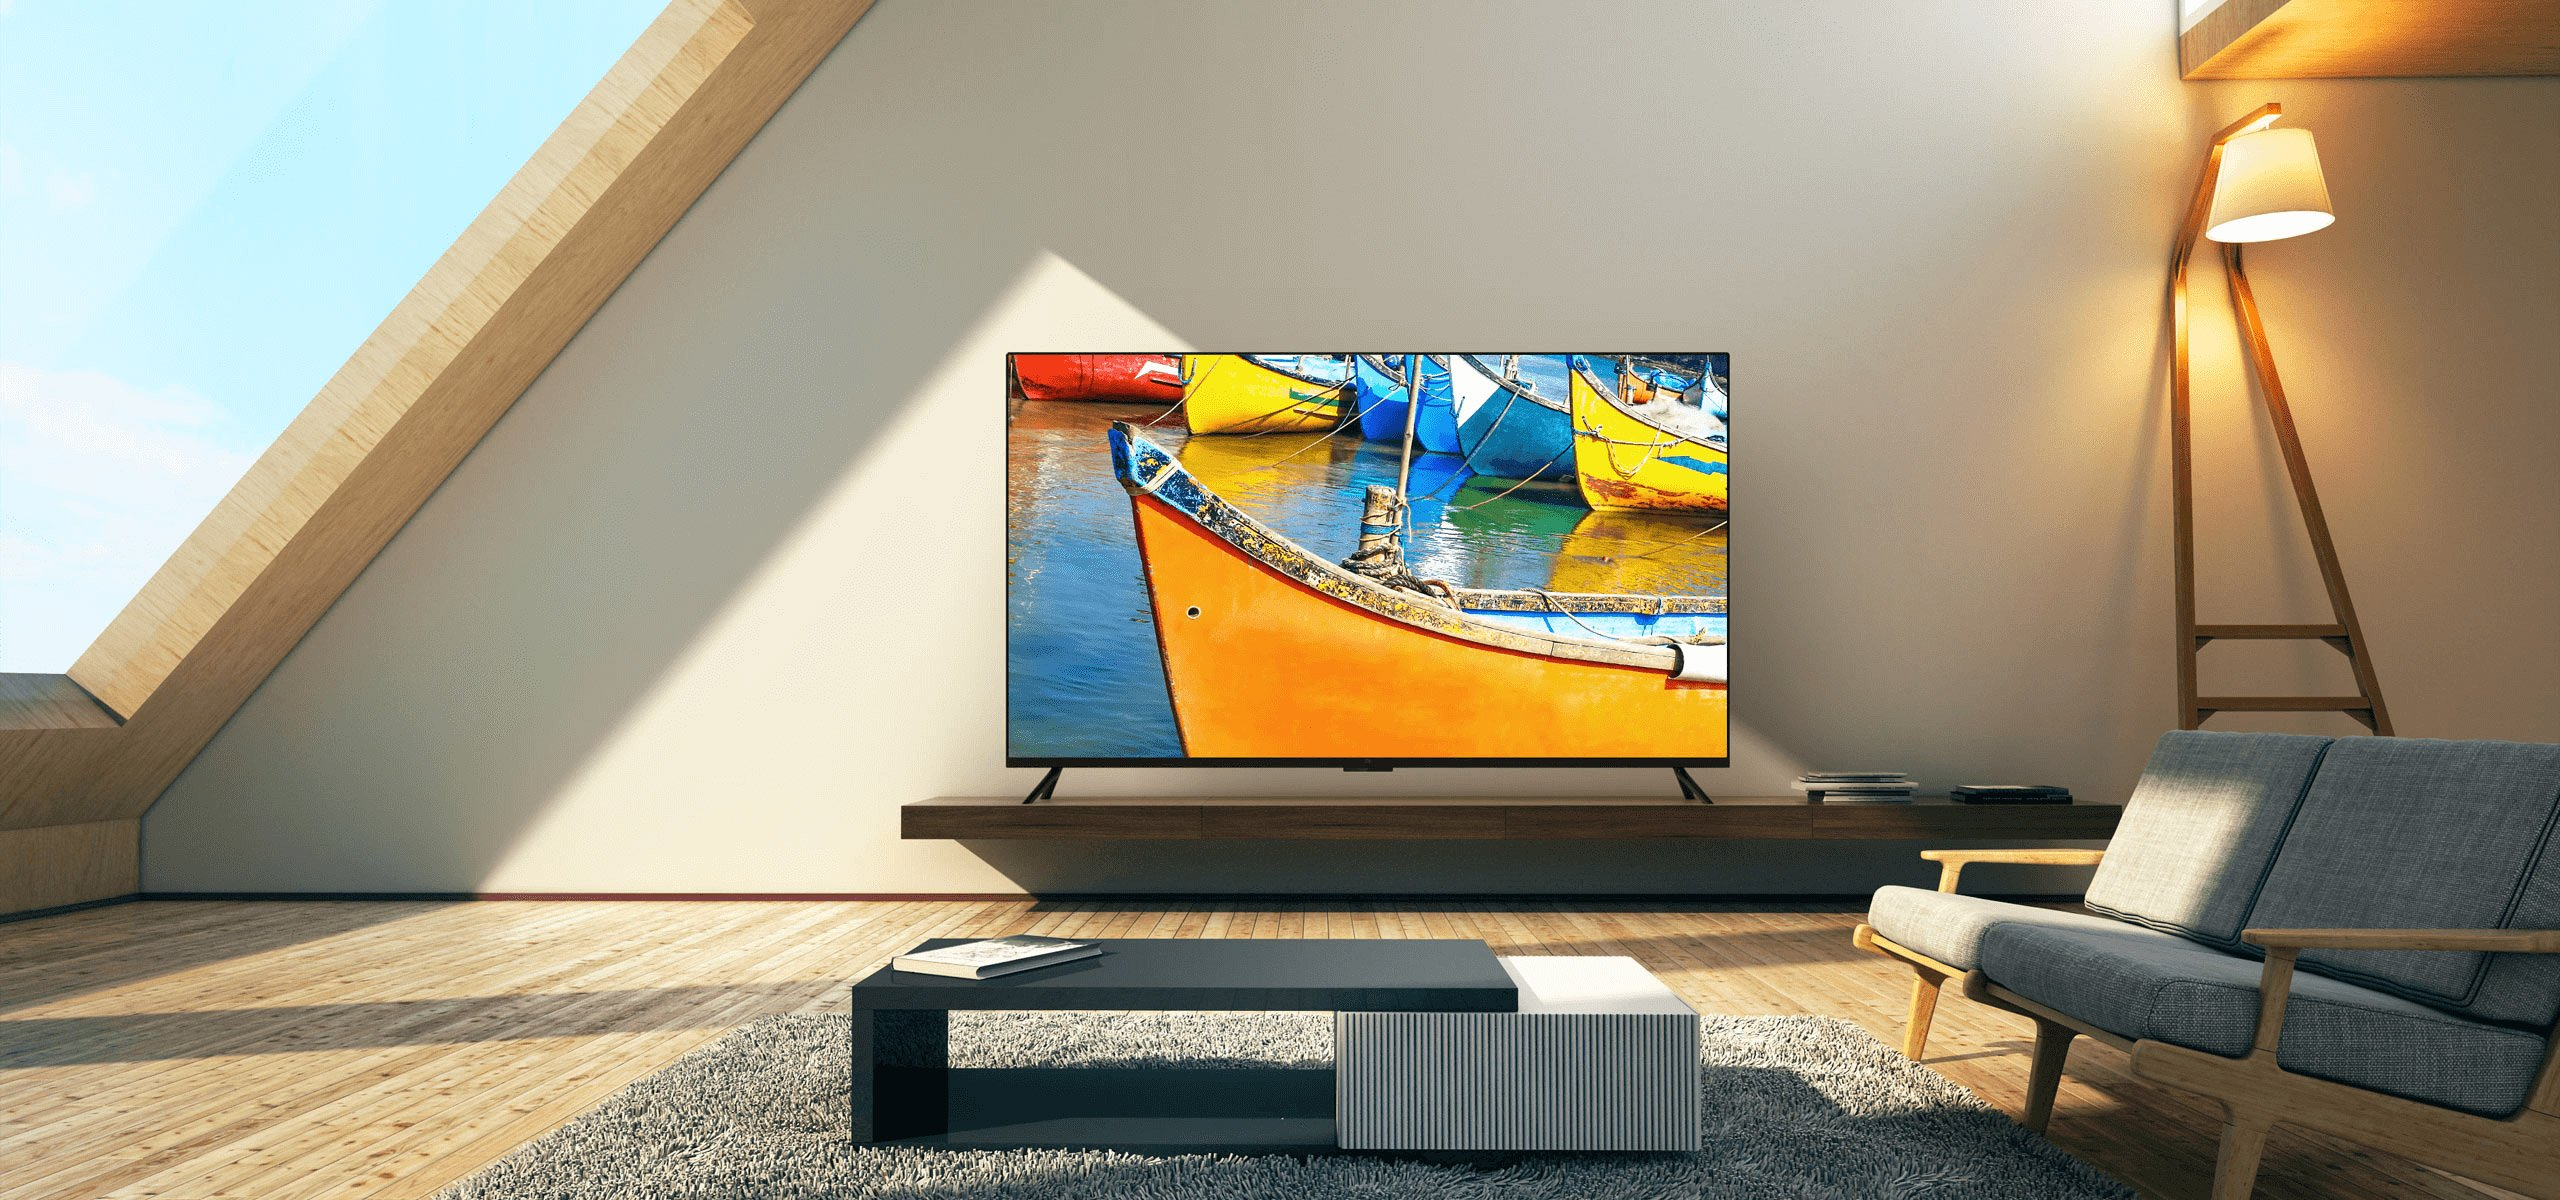 Xiaomi Bawa TV 4K 55 Inch ke Indonesia, Harganya?